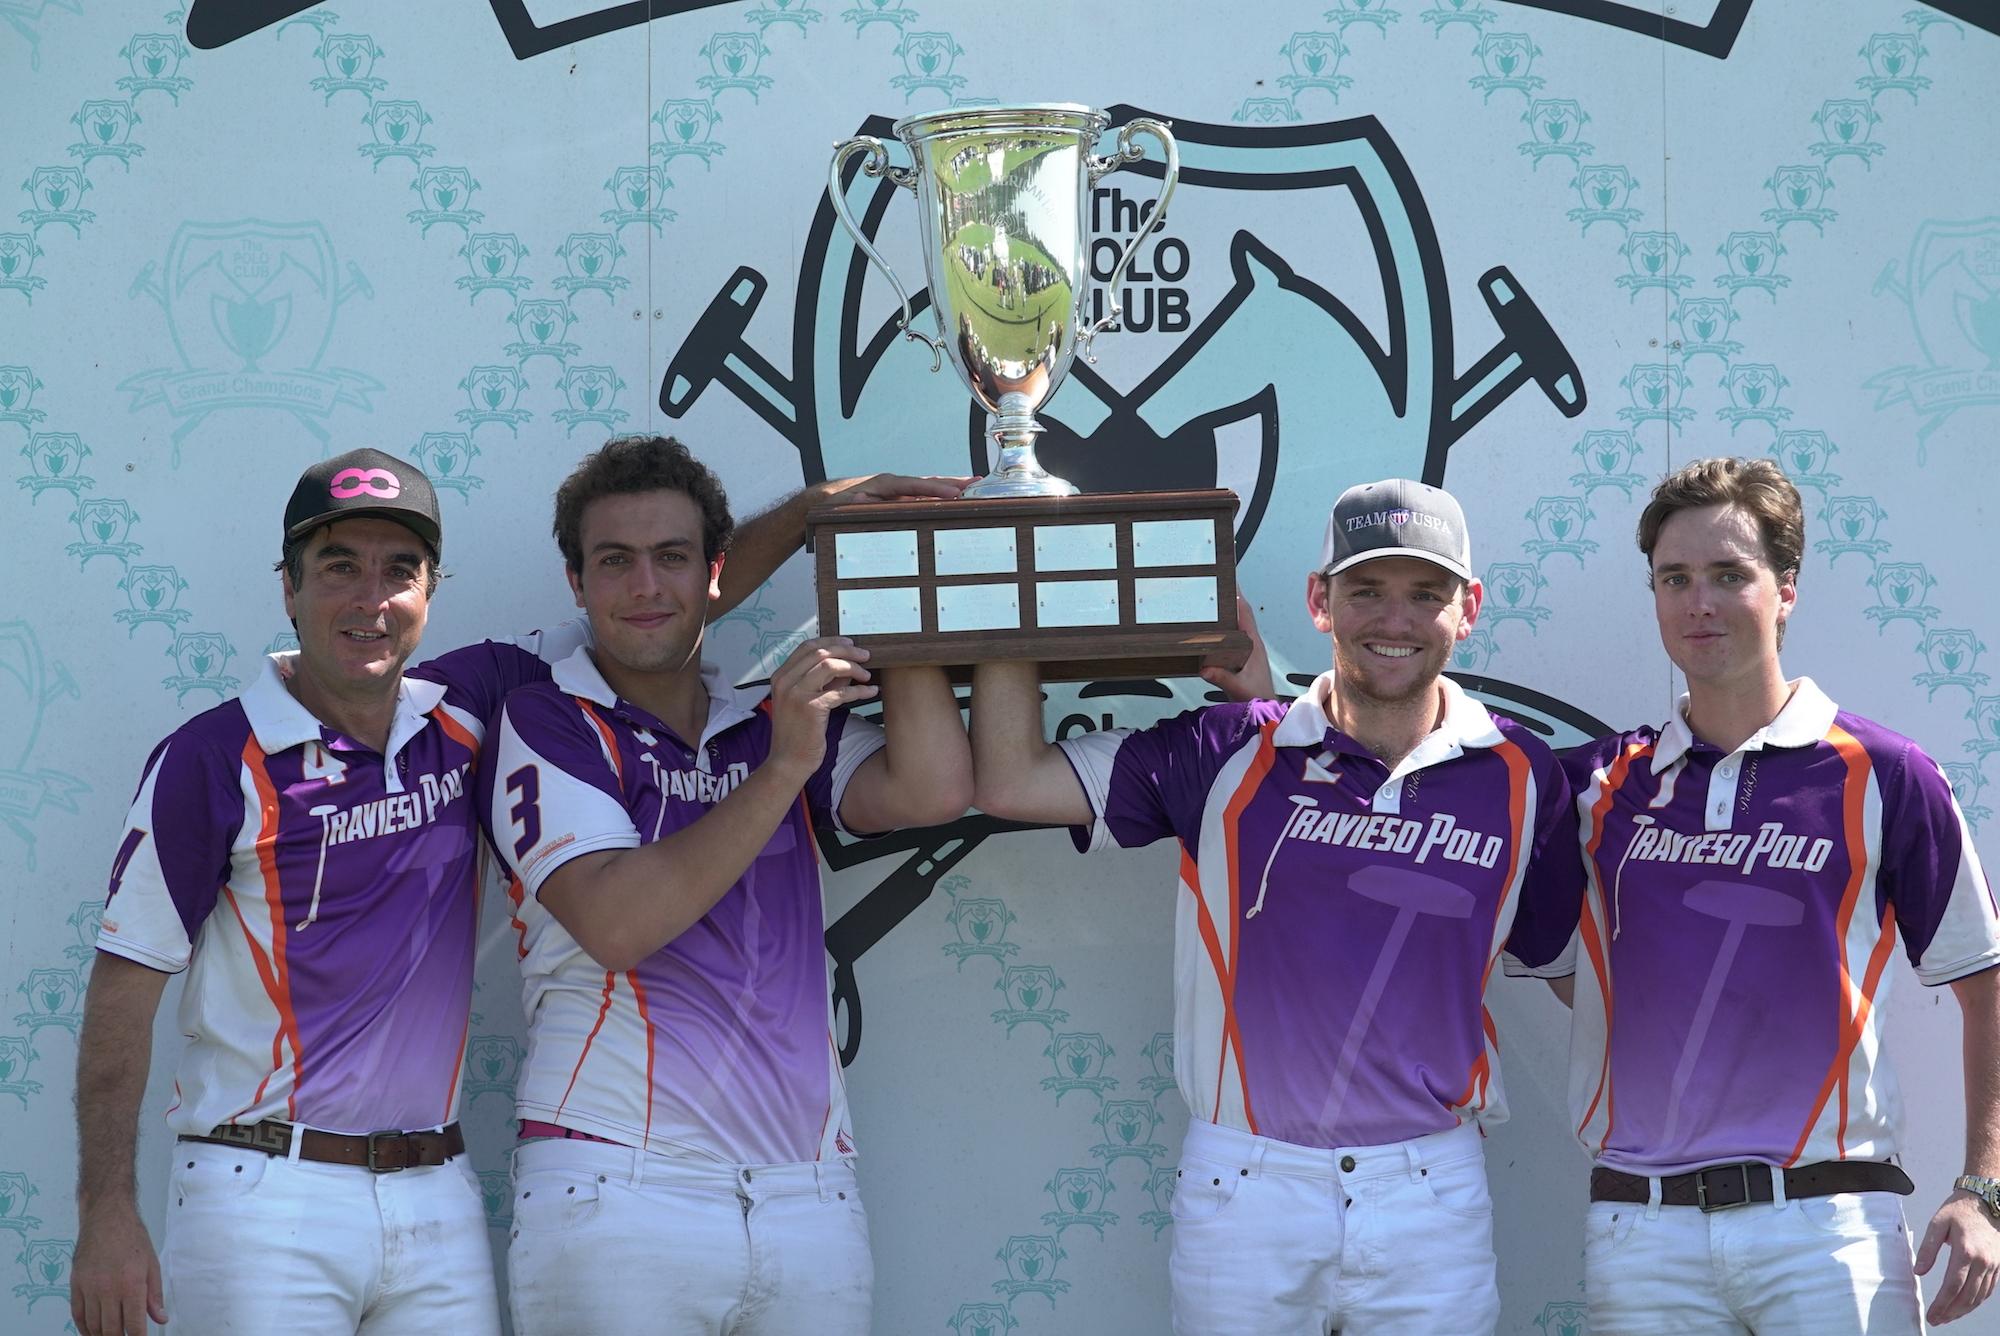 USPA North American Cup champion Tr.JPG